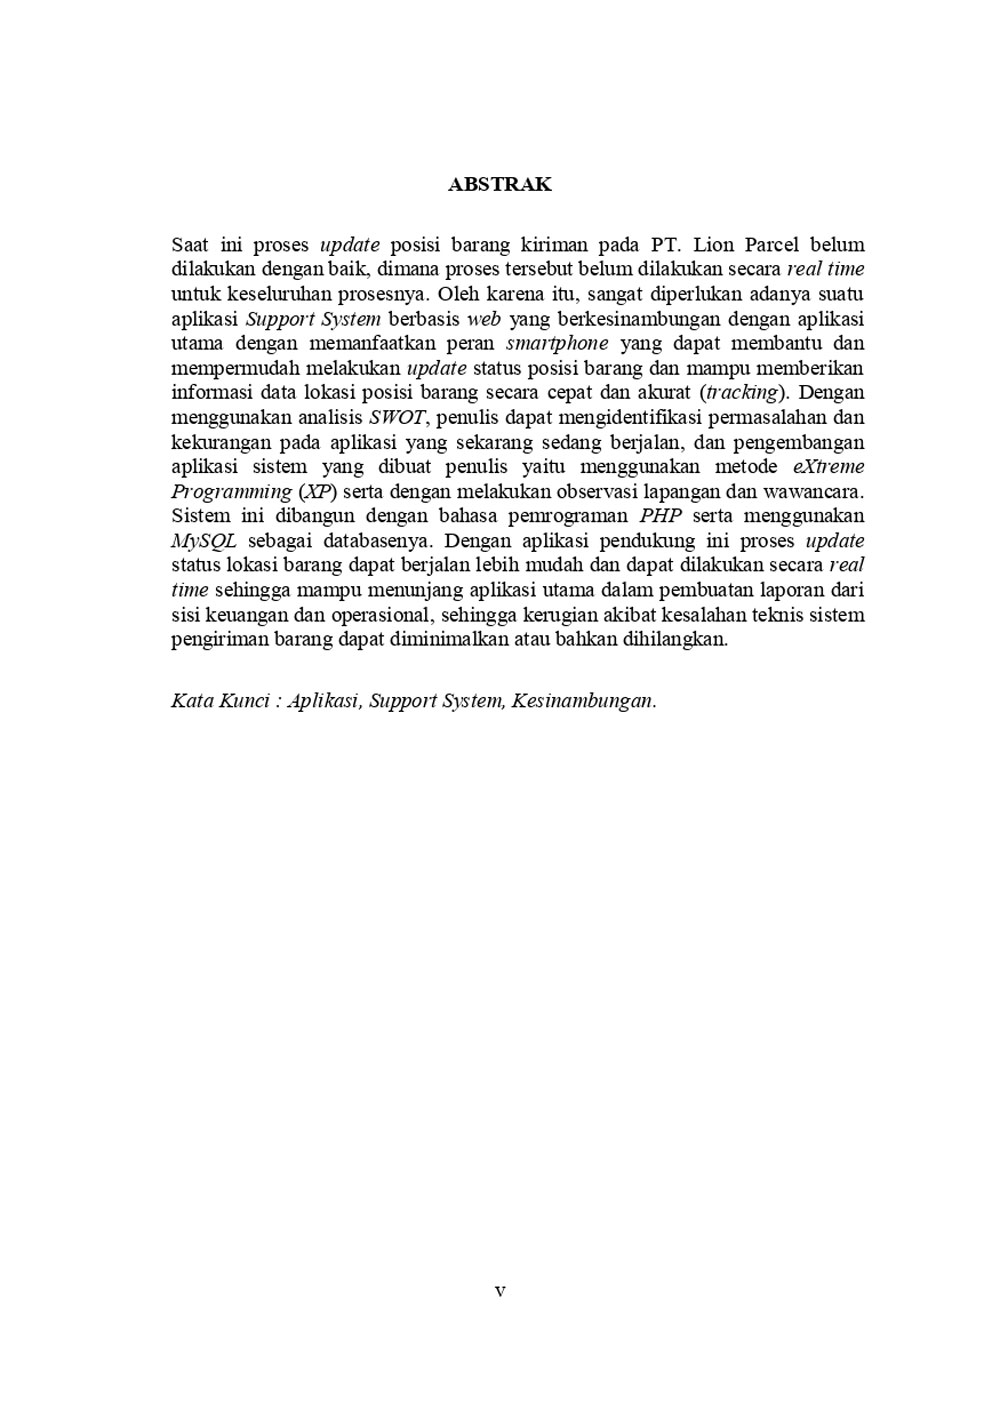 Pembangunan Aplikasi Support System Sebagai Kesinambungan Aplikasi Utama Studi Kasus : PT. LION PARCEL